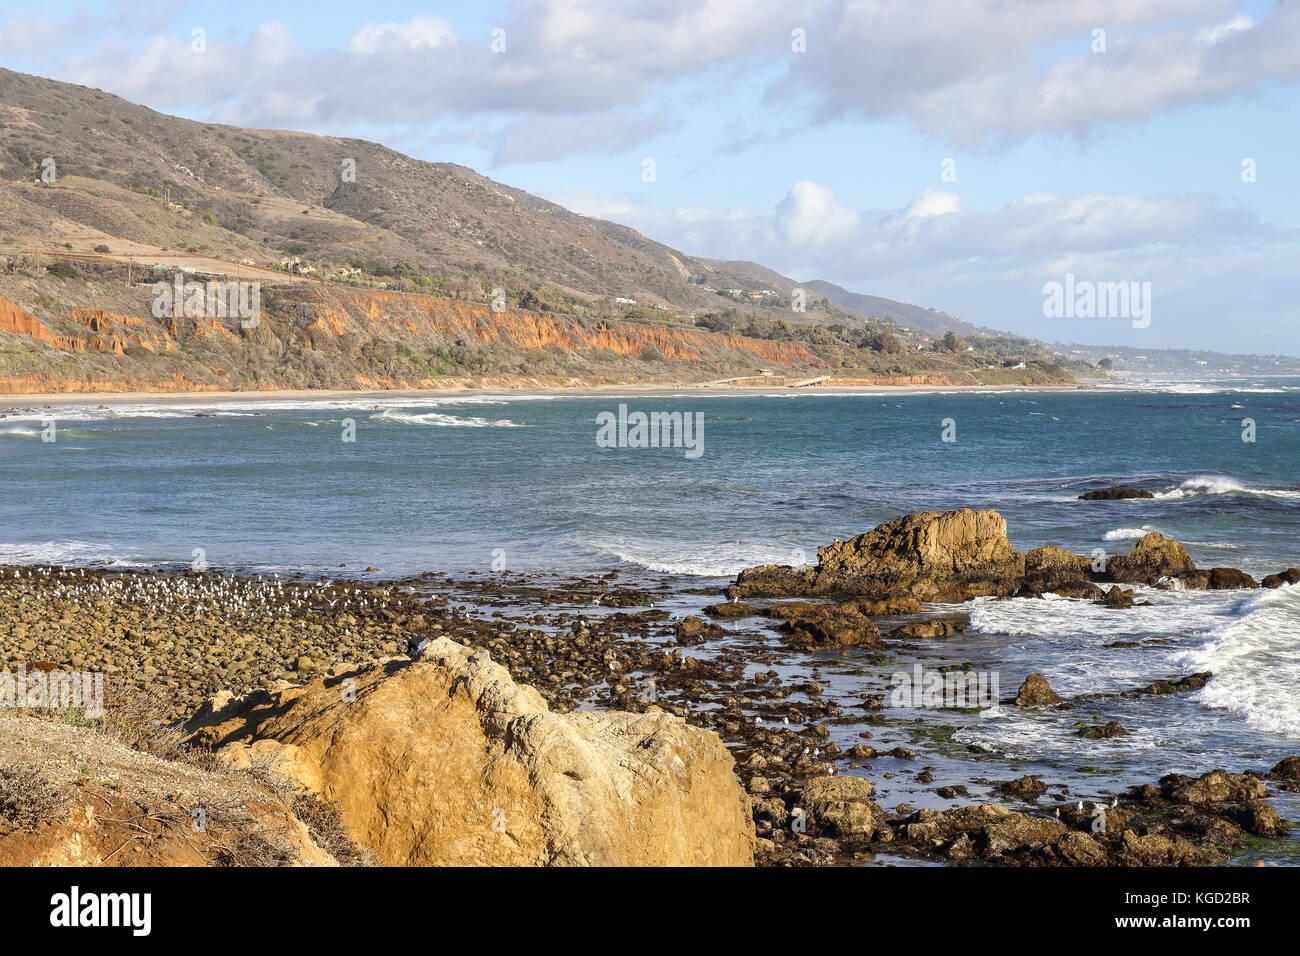 Sunny afternoon at Leo Carrillo State Beach, Malibu California Stock Photo